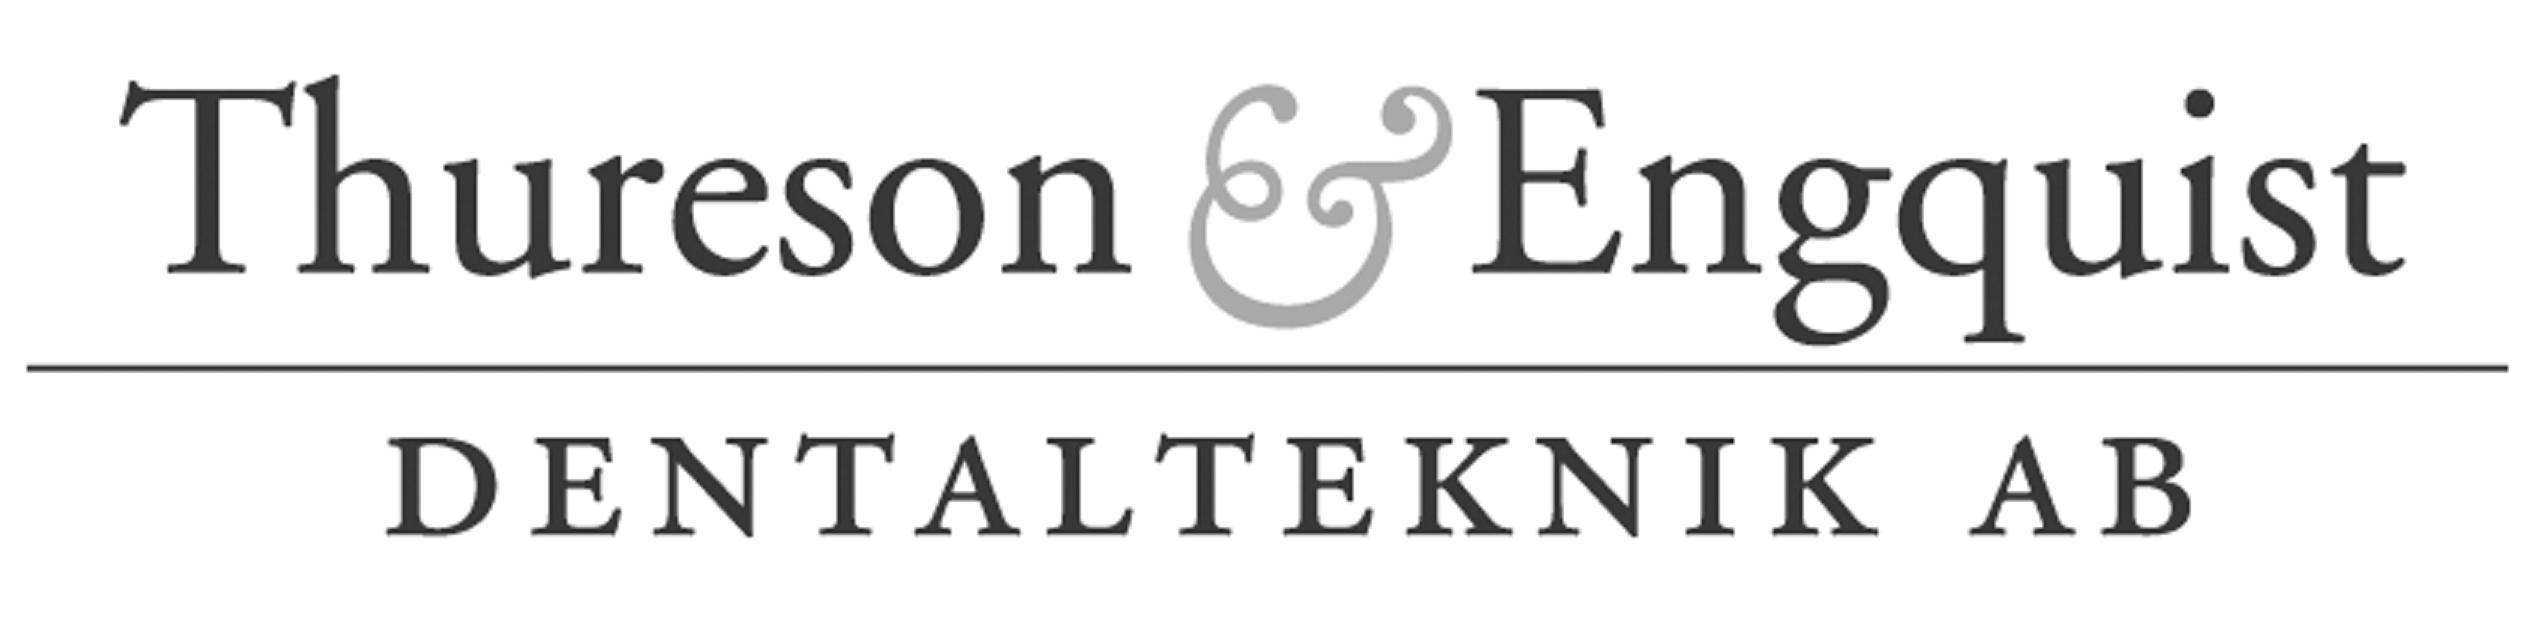 Thureson & Engquist Dentalteknik AB